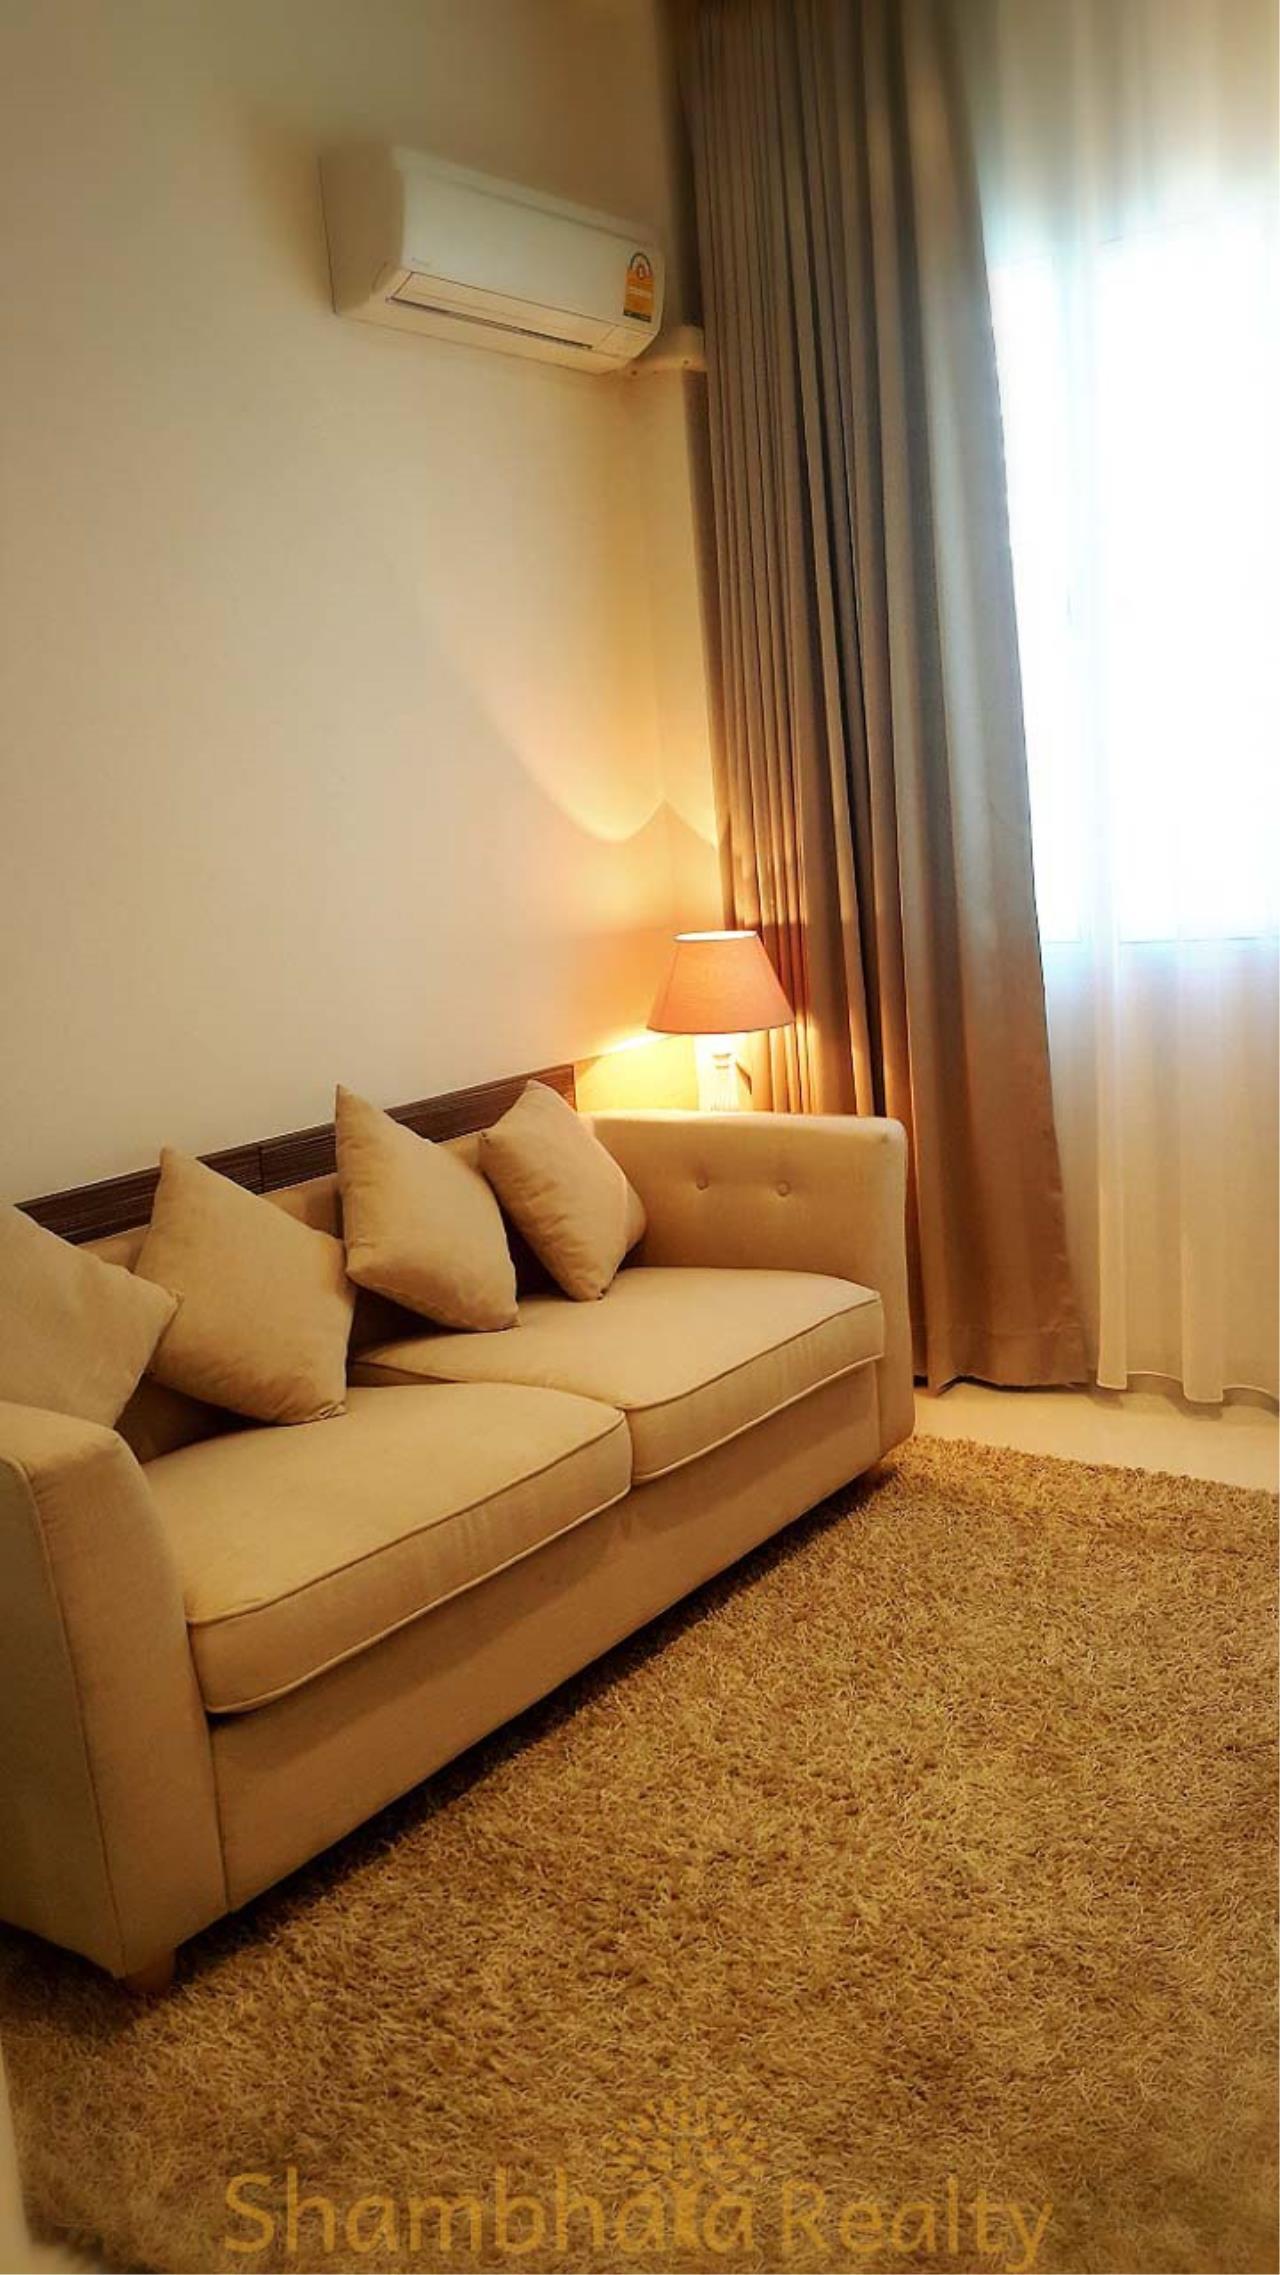 Shambhala Realty Agency's UR Thonglor Condominium for Rent in Thonglor 8